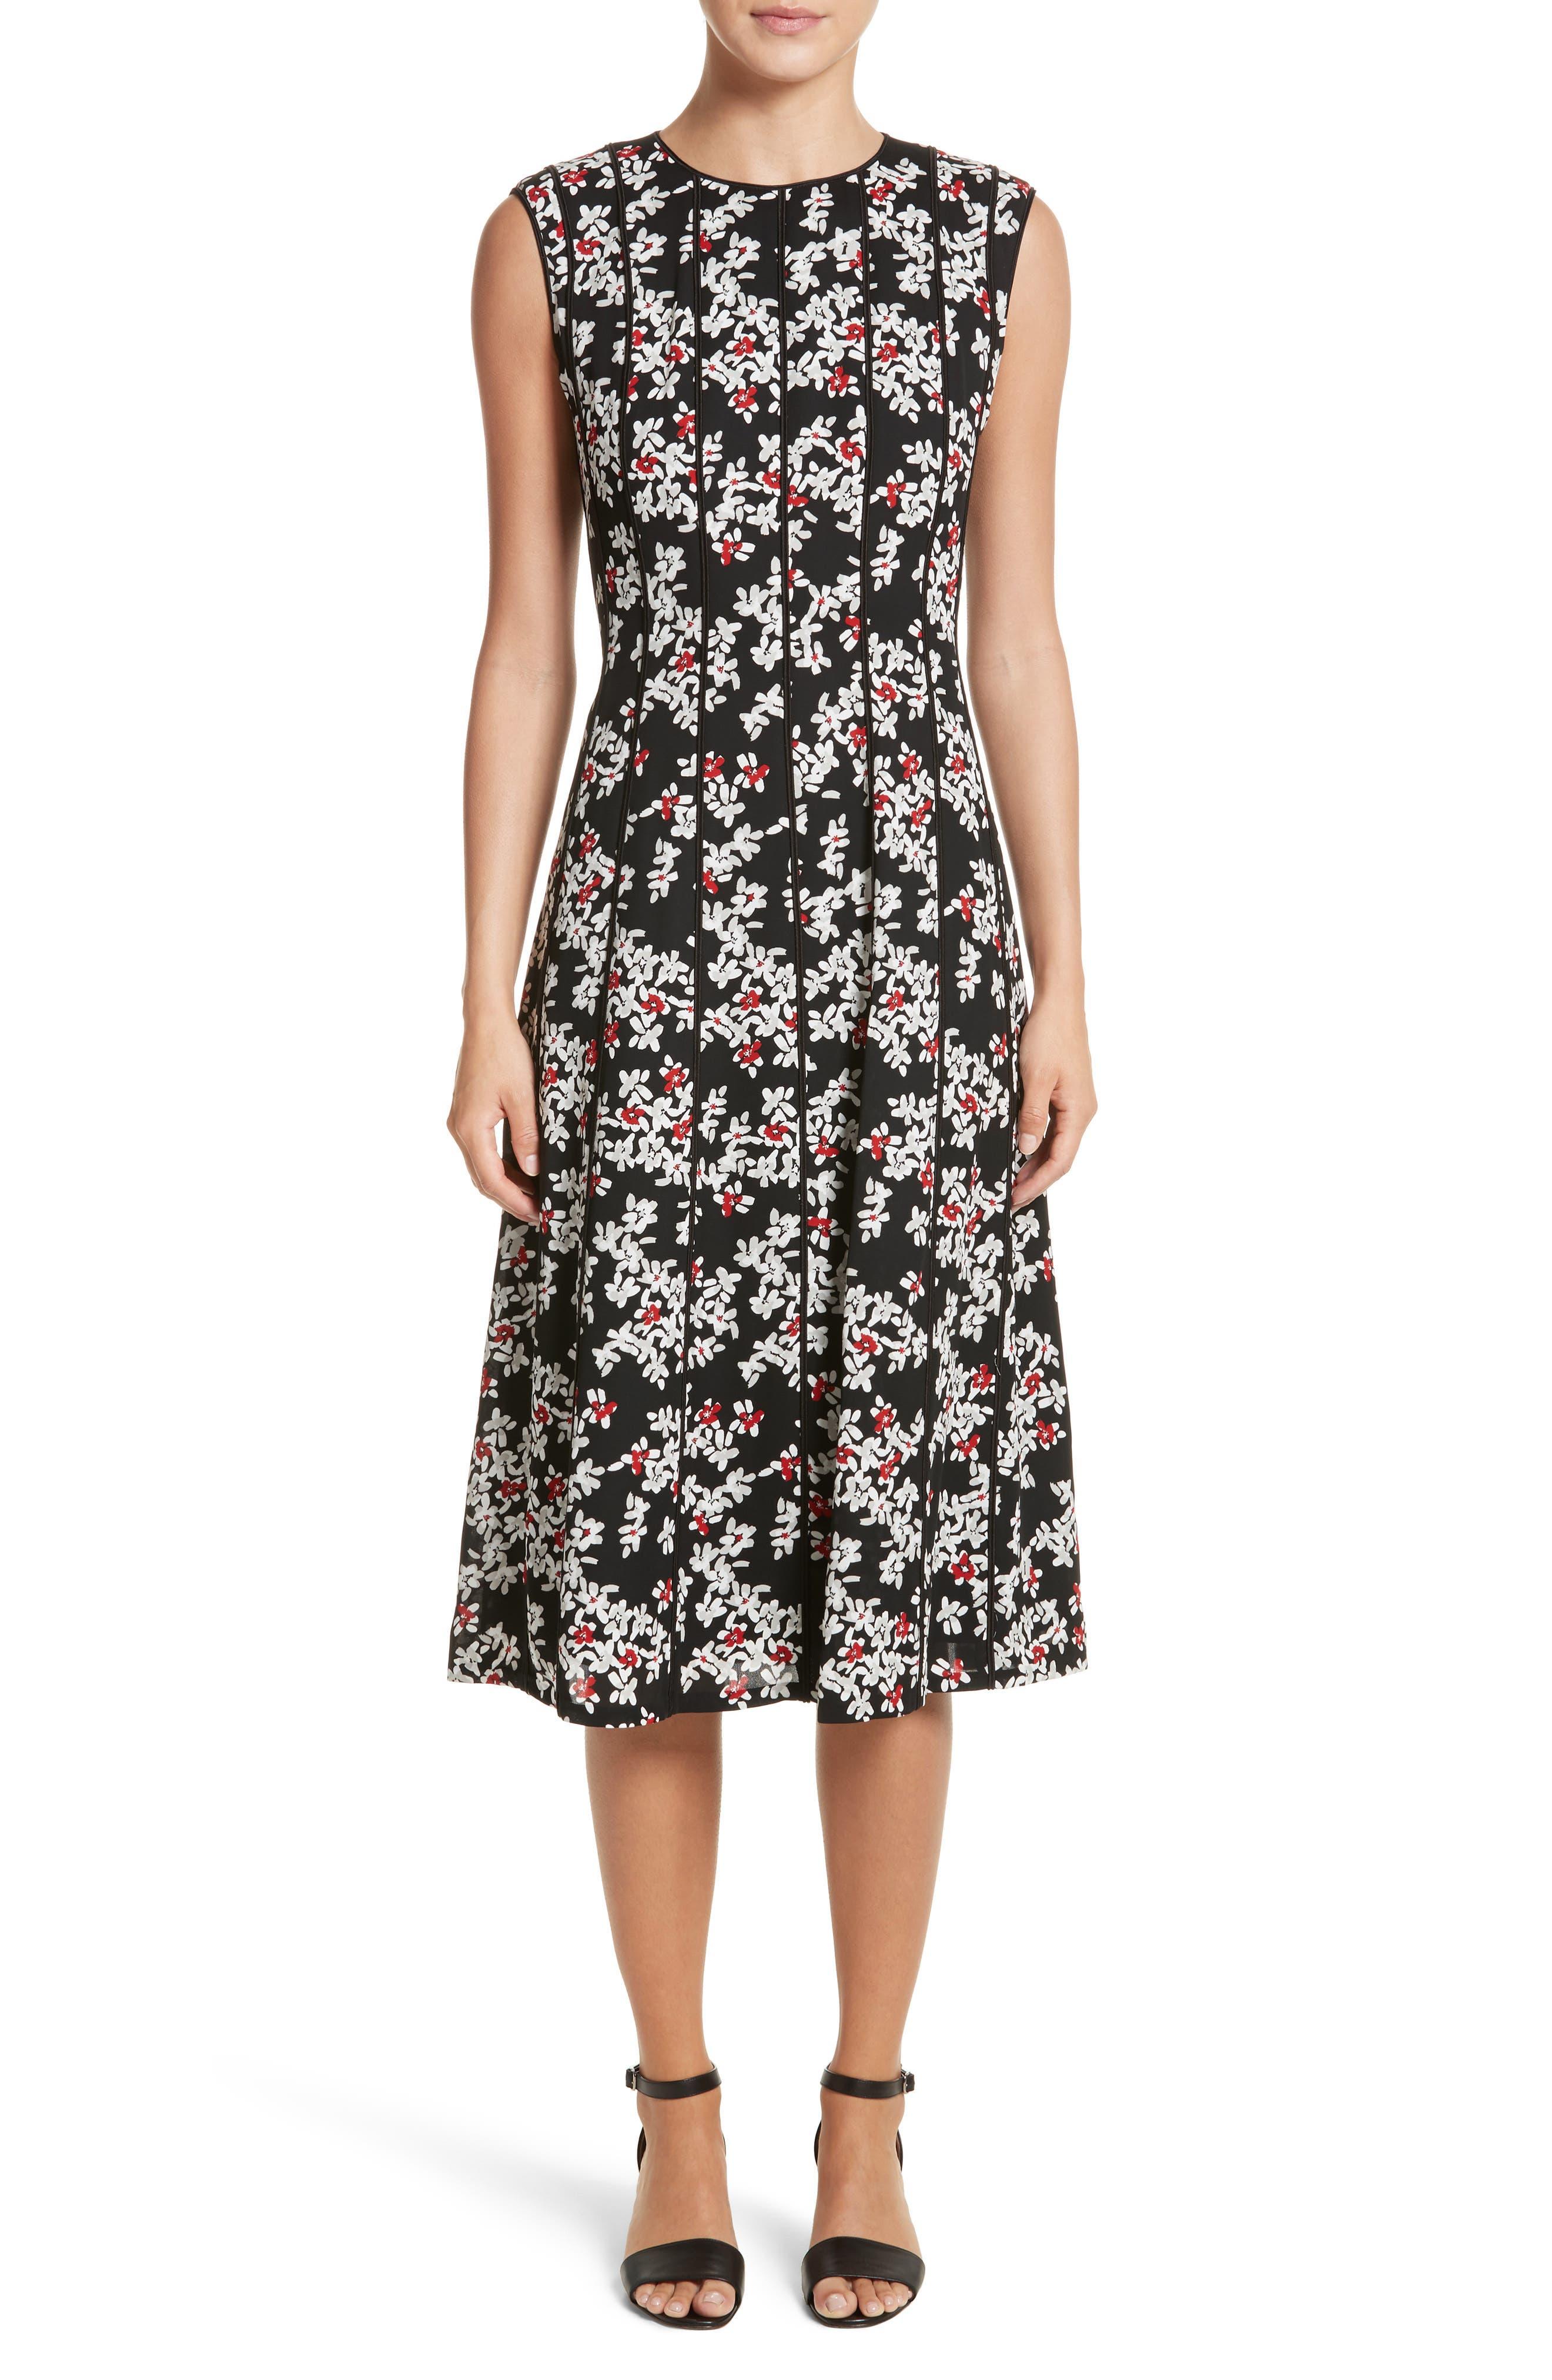 Main Image - Lafayette 148 New York Marley Fresh Floral Drape Cloth Dress